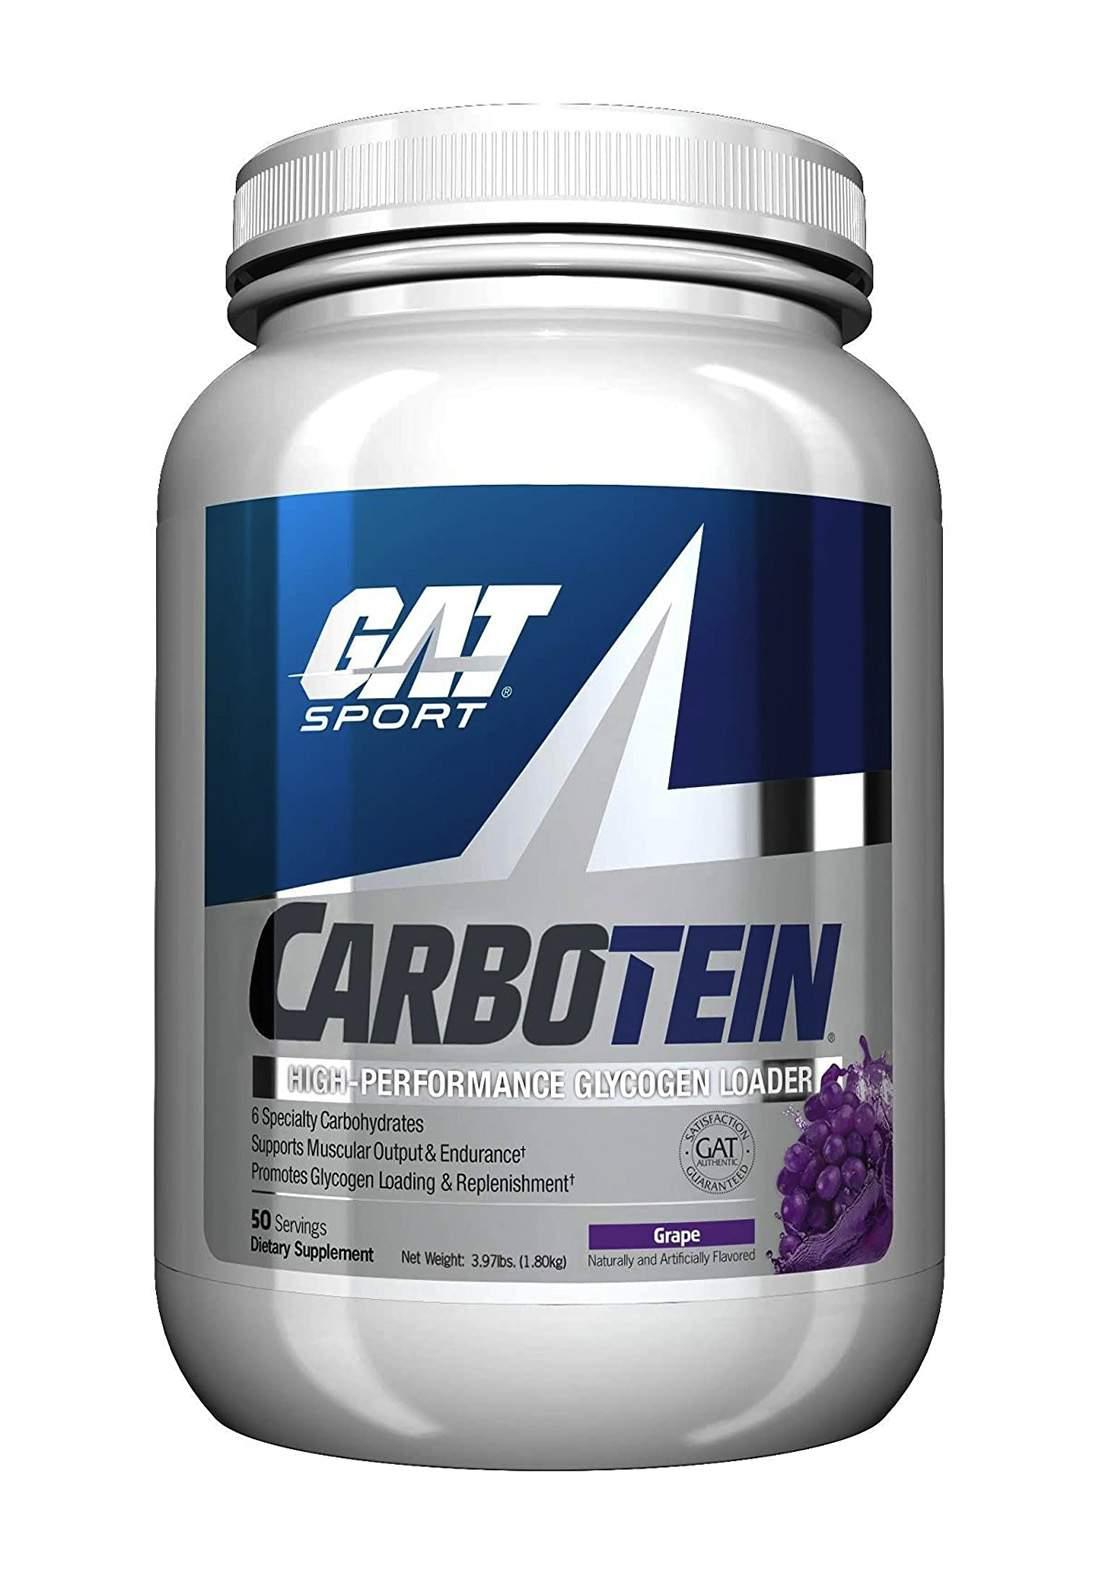 Gat Sport Carbotein Supplement, Grape, 1.80kg مكمل غذئى